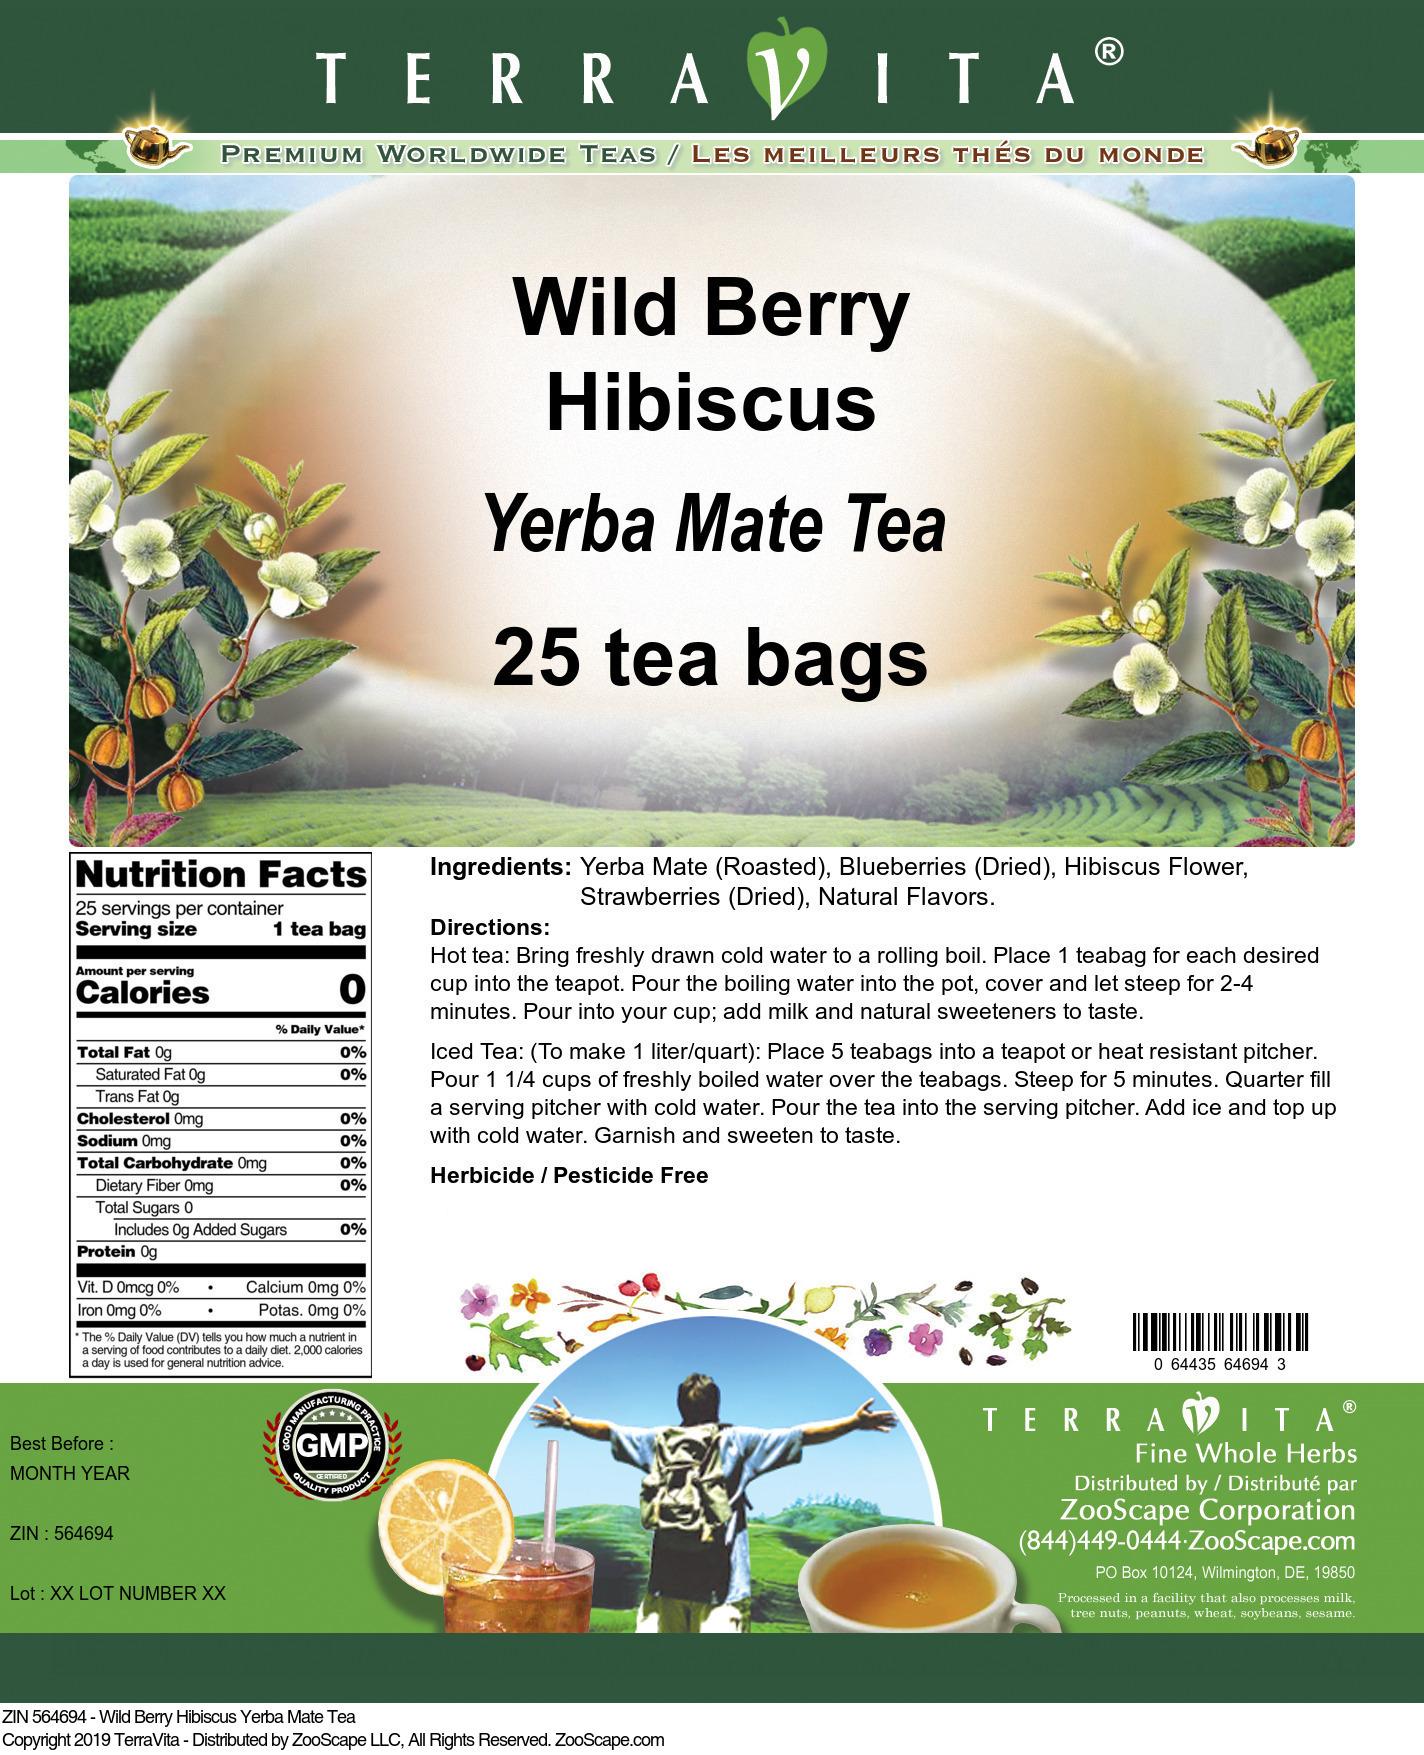 Wild Berry Hibiscus Yerba Mate Tea